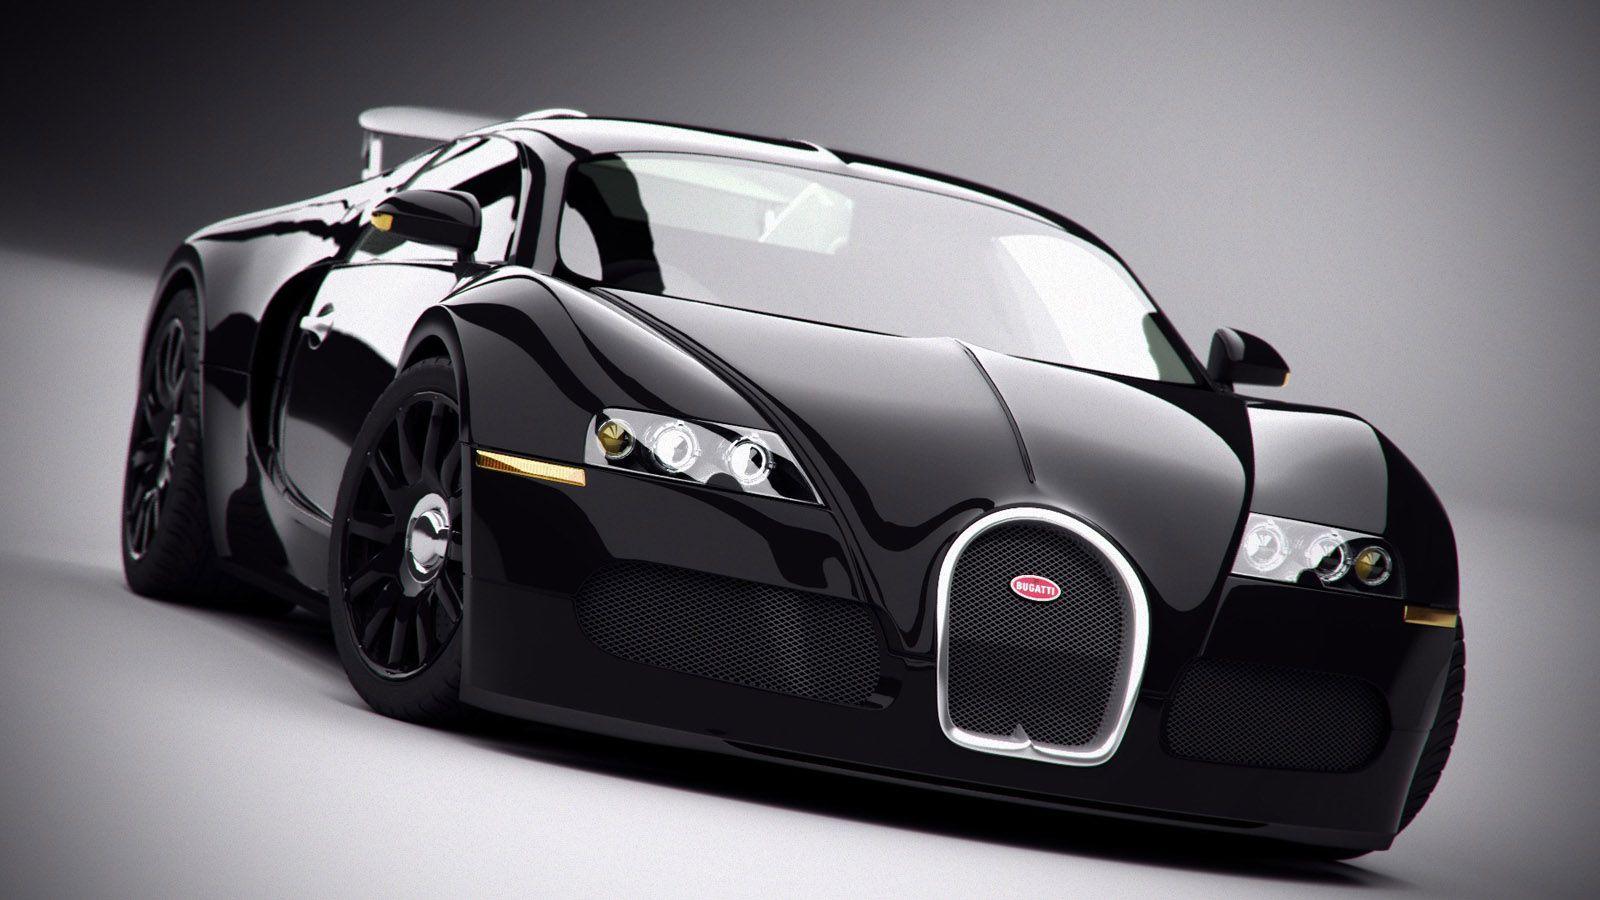 2014 bugatti veyron super sport specs 2014 bugatti veyron super